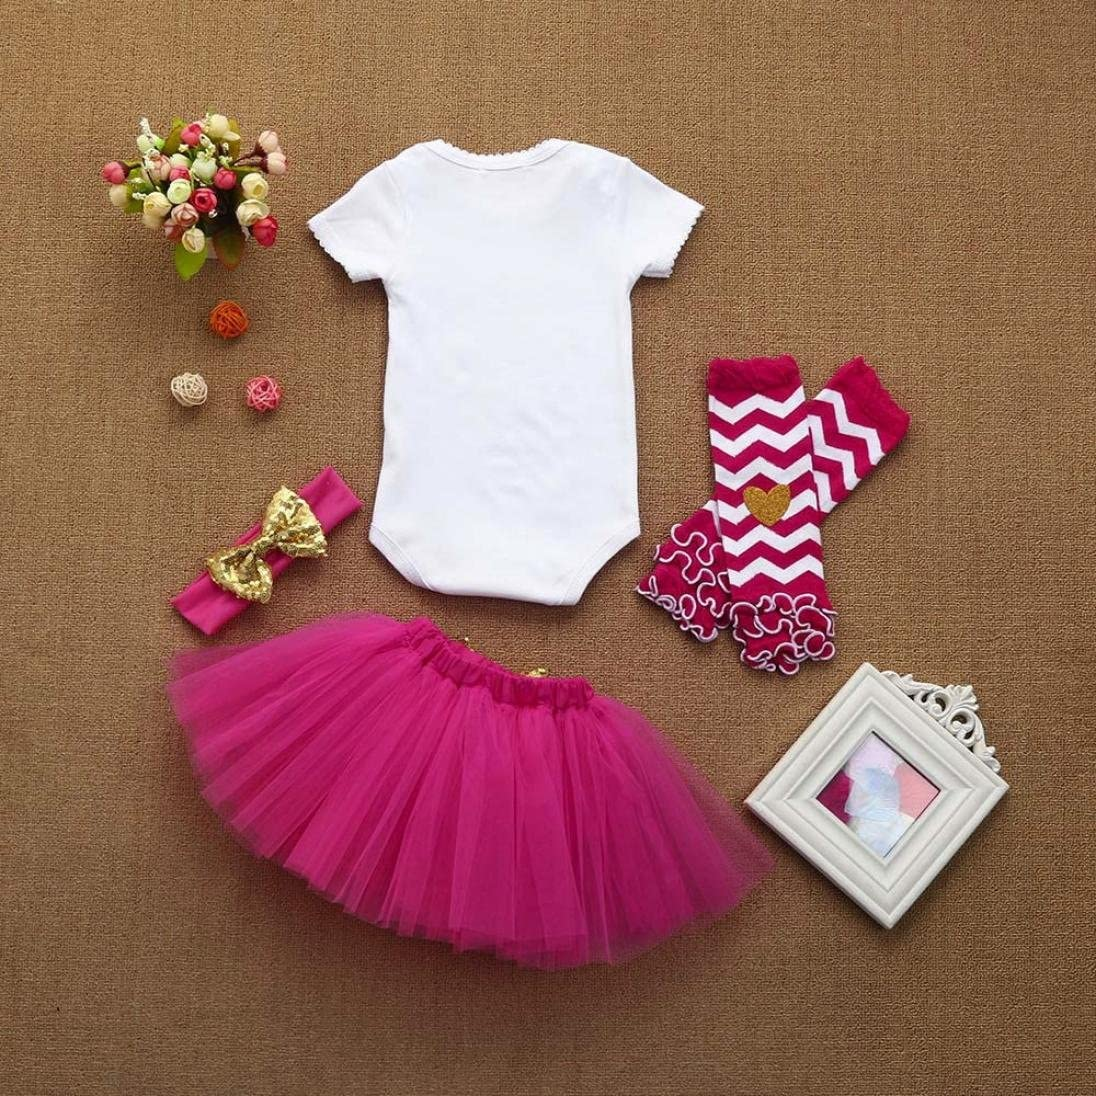 FORESTIME Baby Girls Cute Princess Birthday Party Letter Pomper Tutu Chiffon Skirt Headband Set